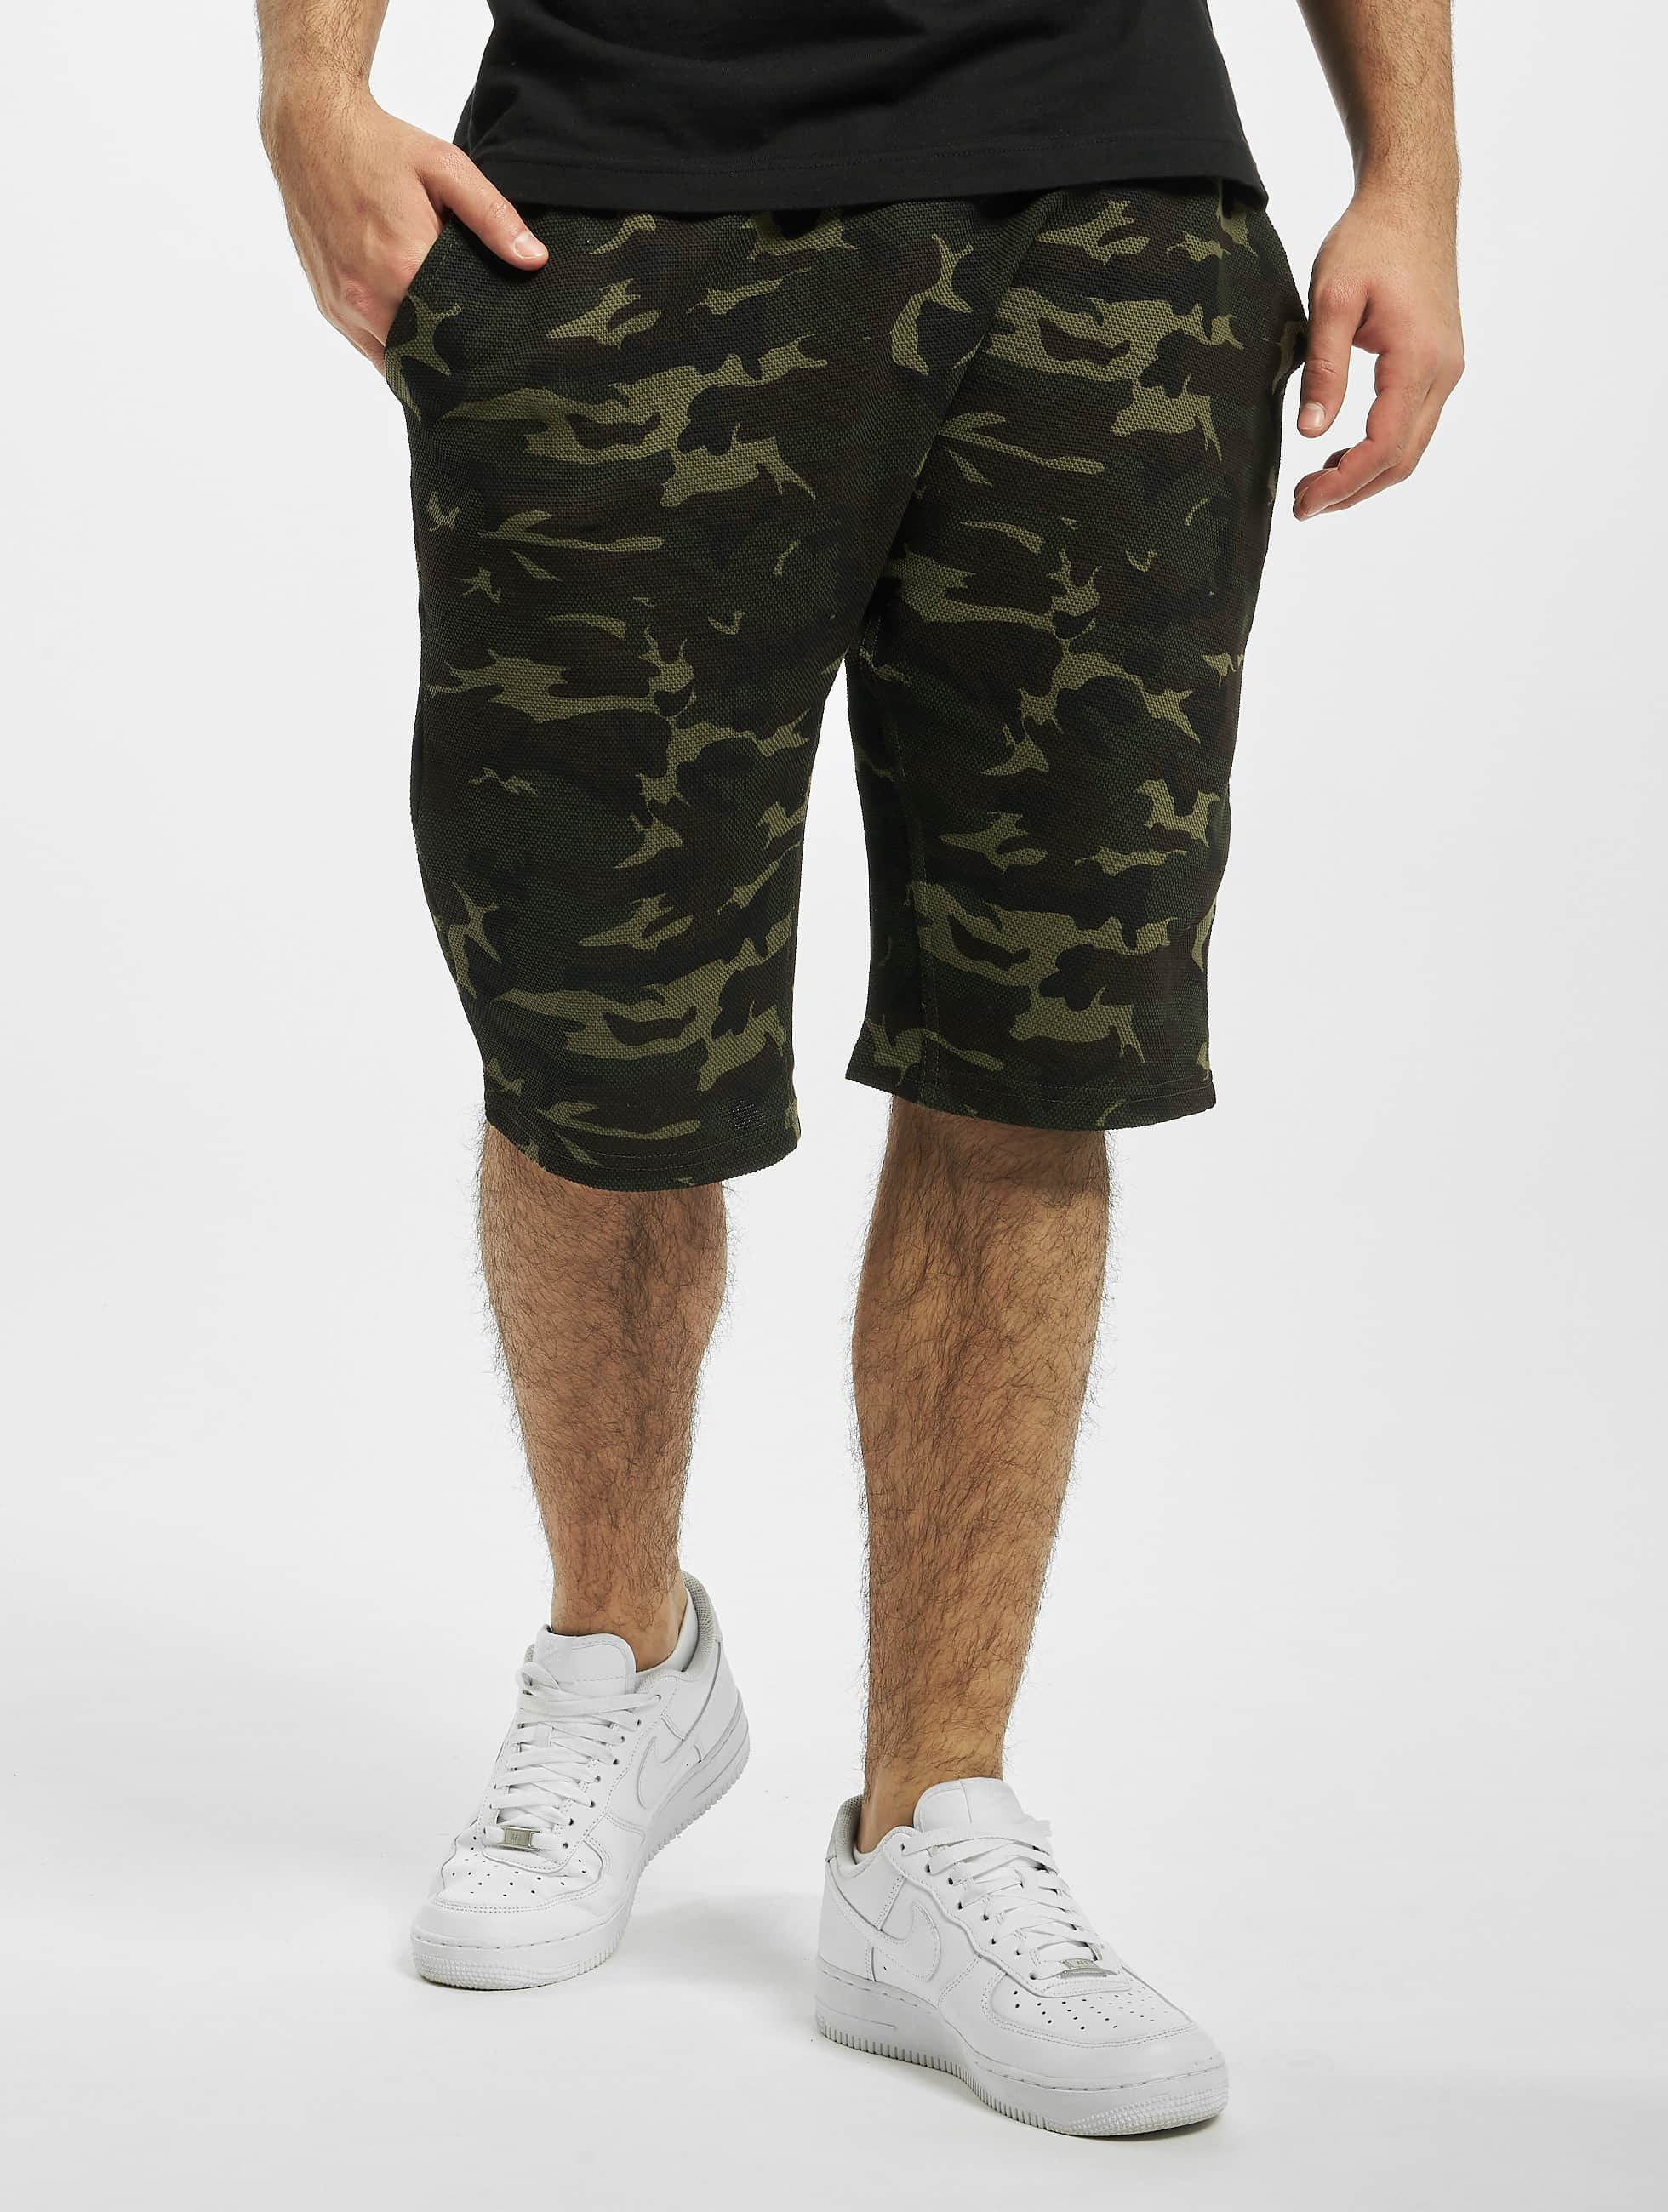 DEF / Short Leo in camouflage 2XL